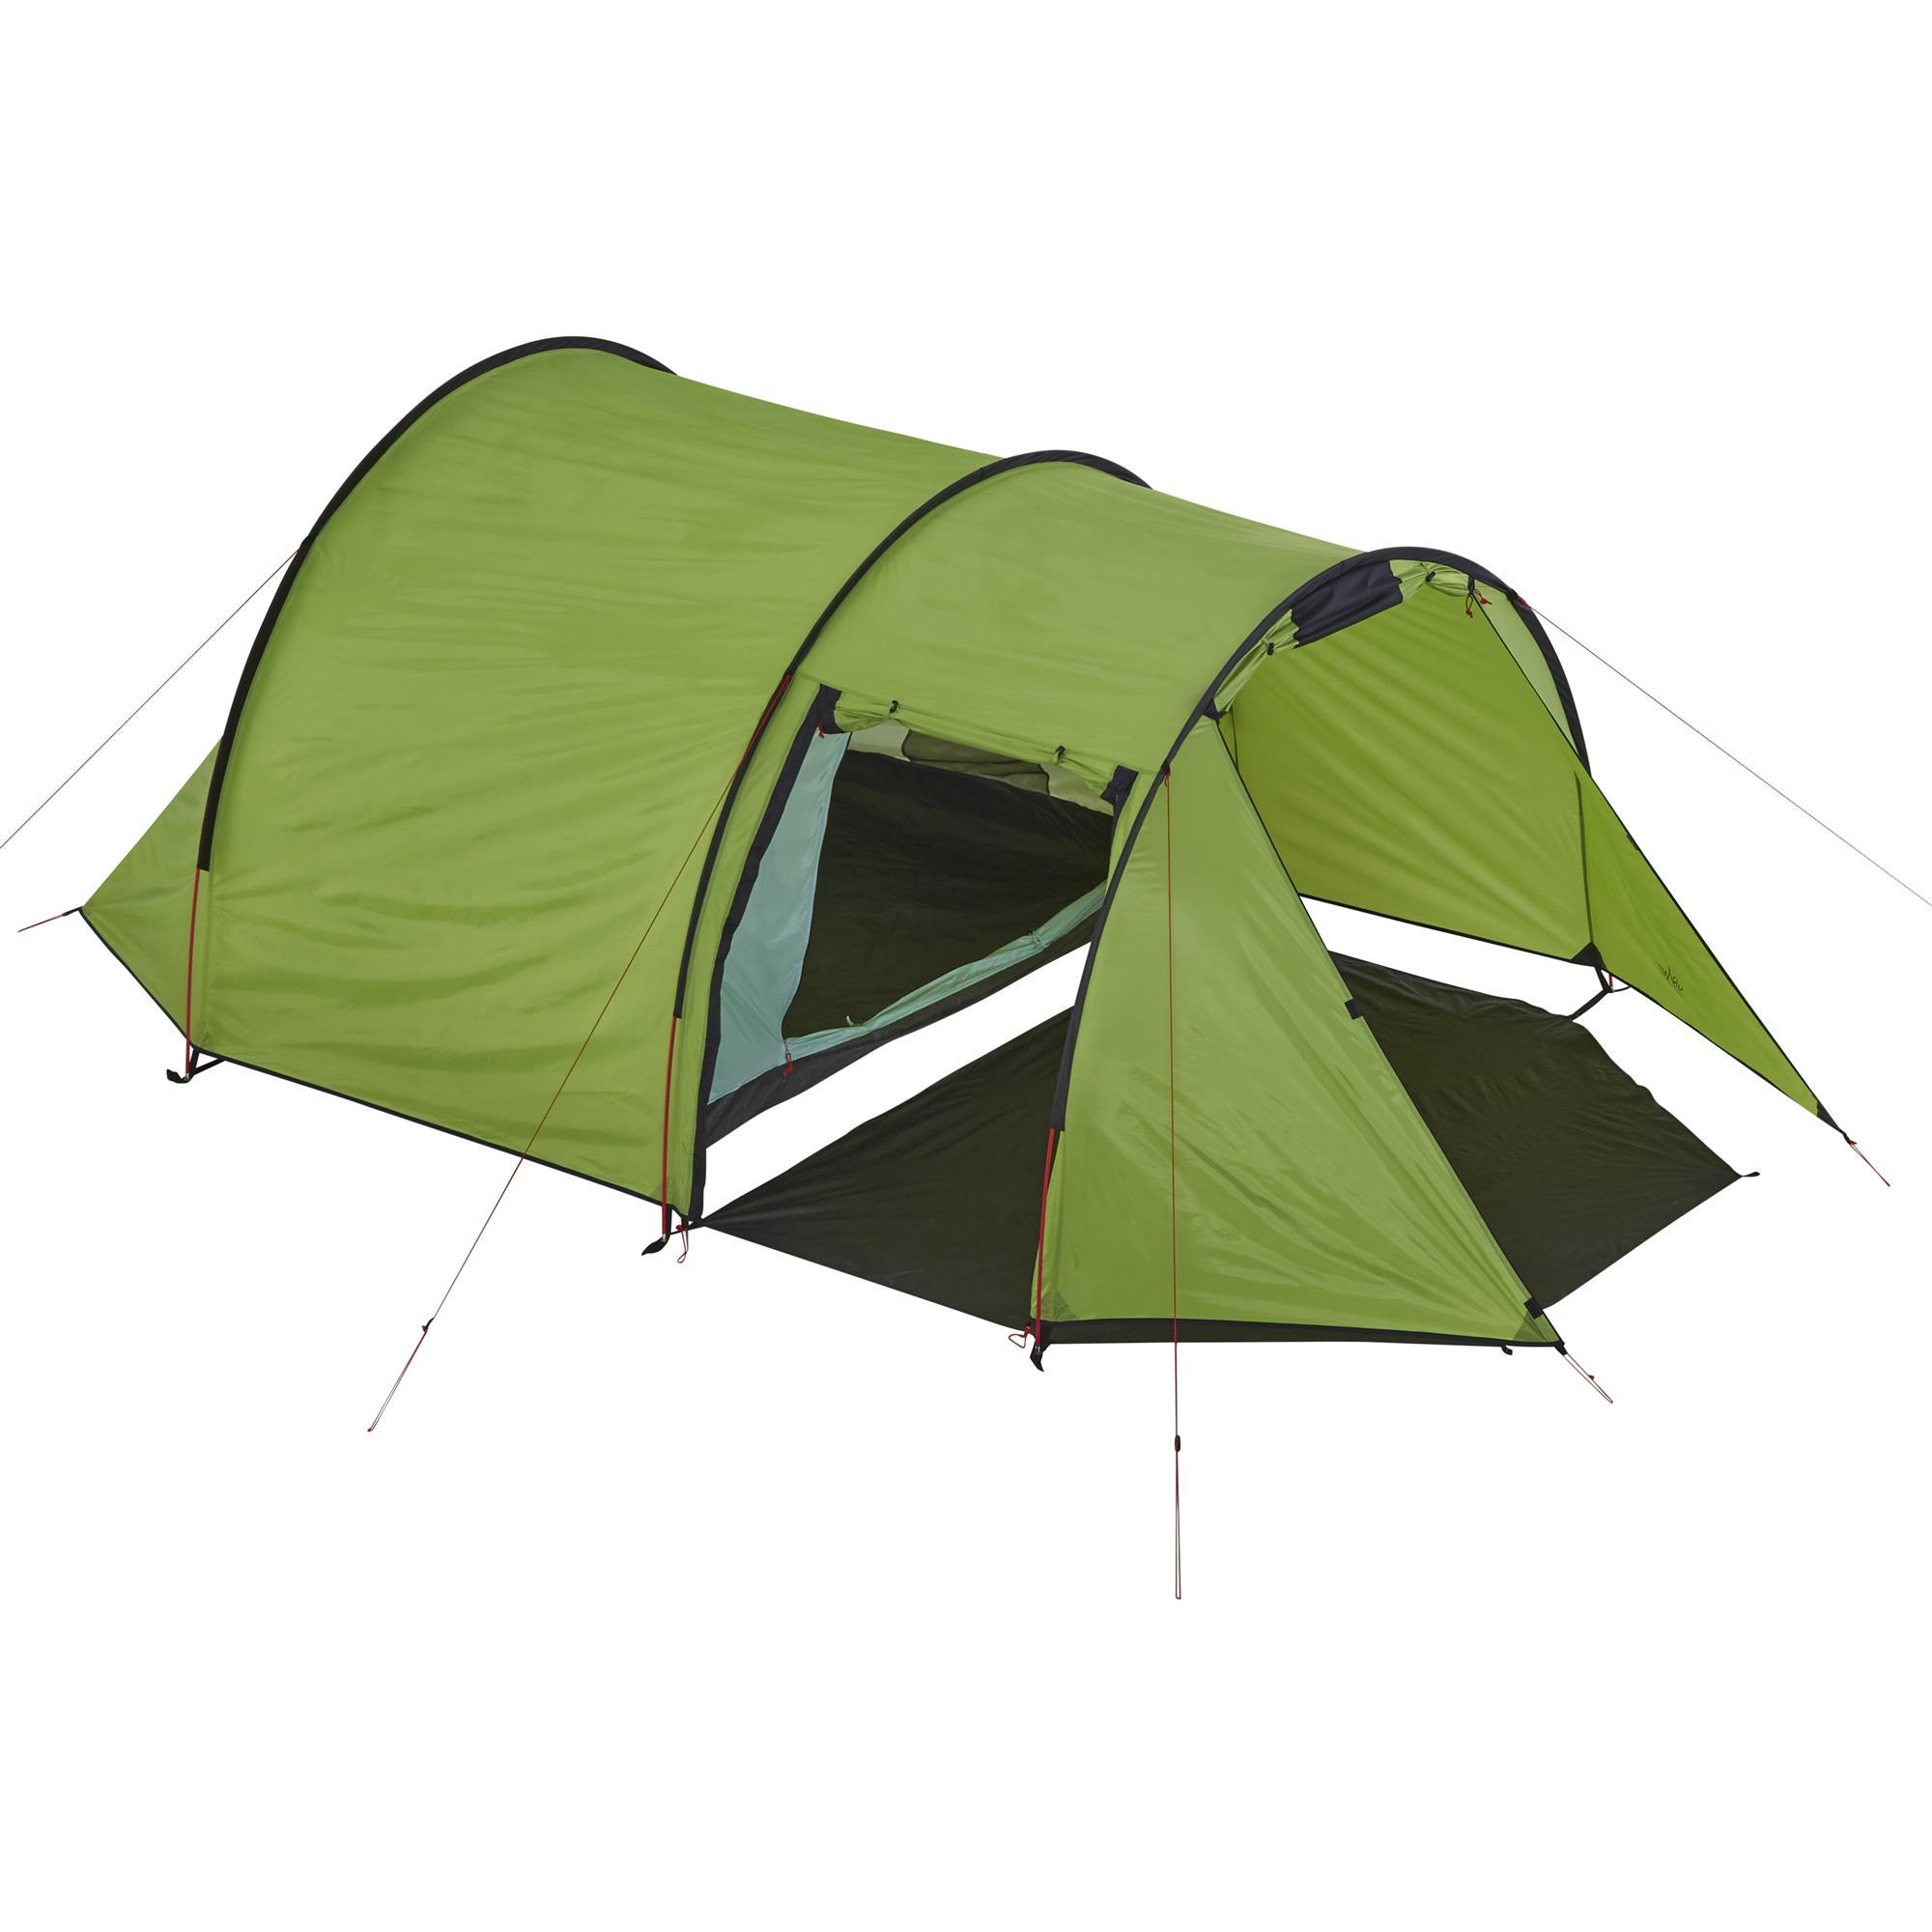 Grand Canyon Robson Campingzelt grün,green Preisvergleich